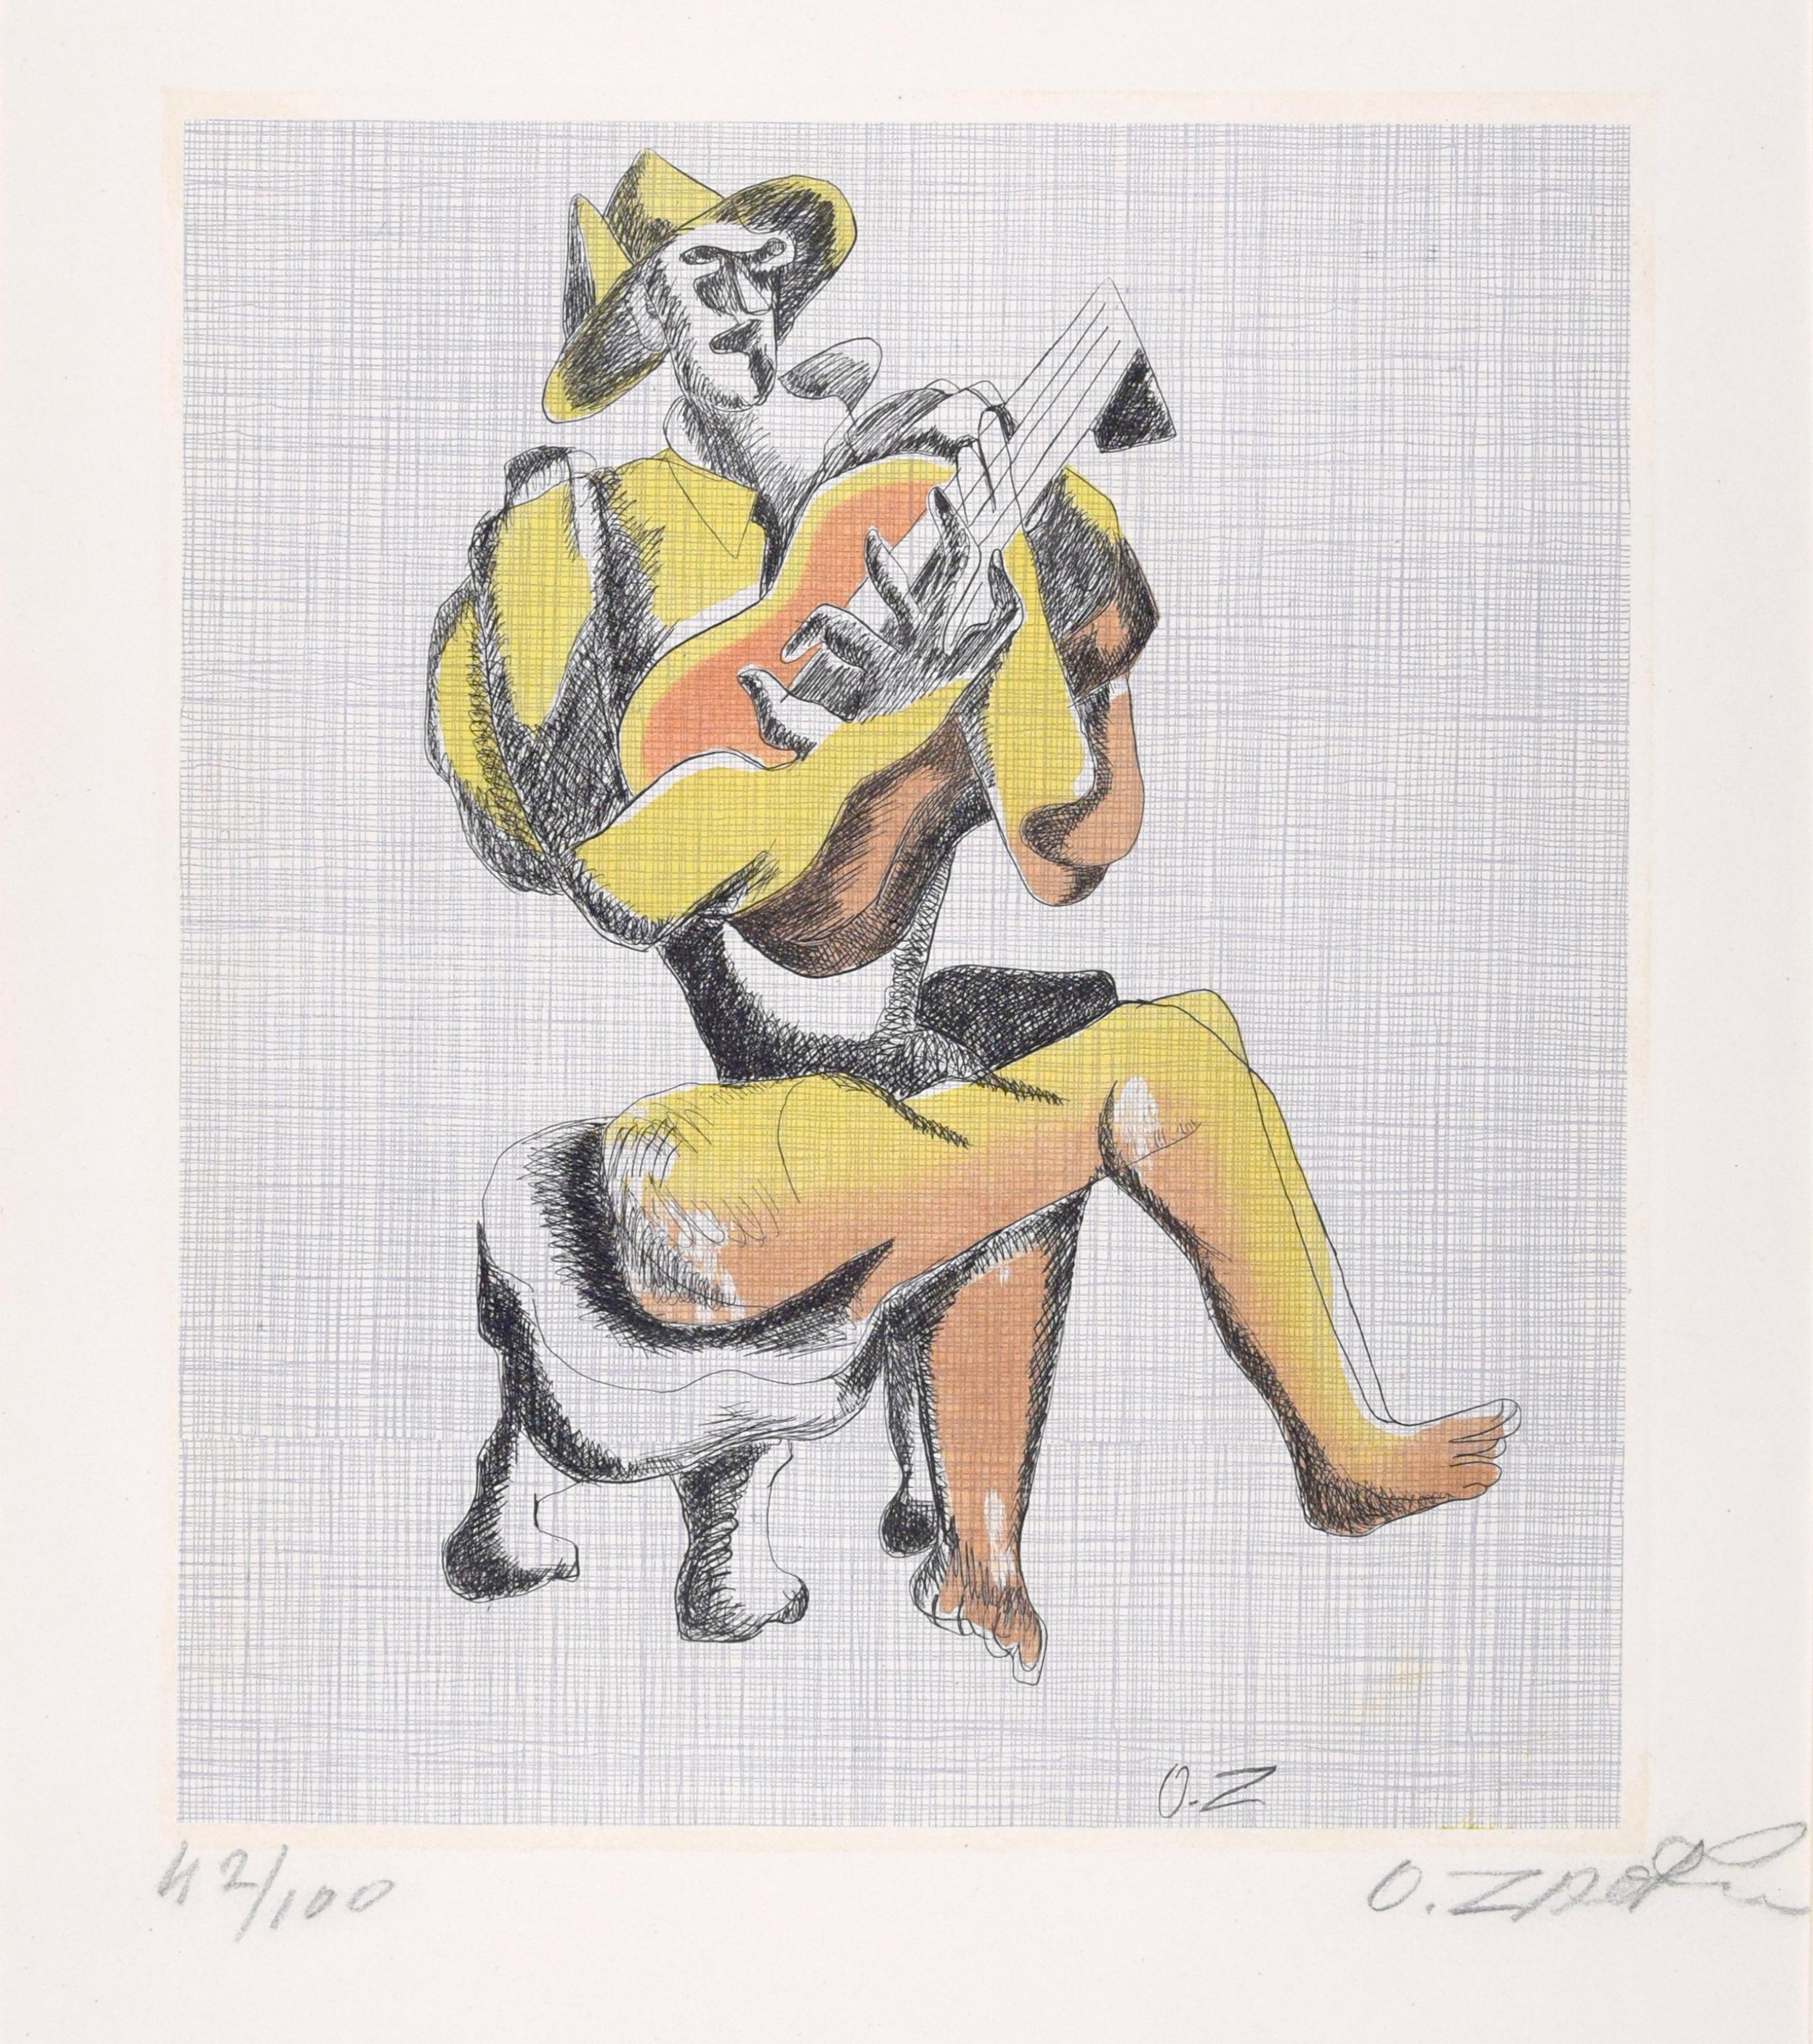 Le Guitariste - Original Etching by Ossip Zadkine - 1966